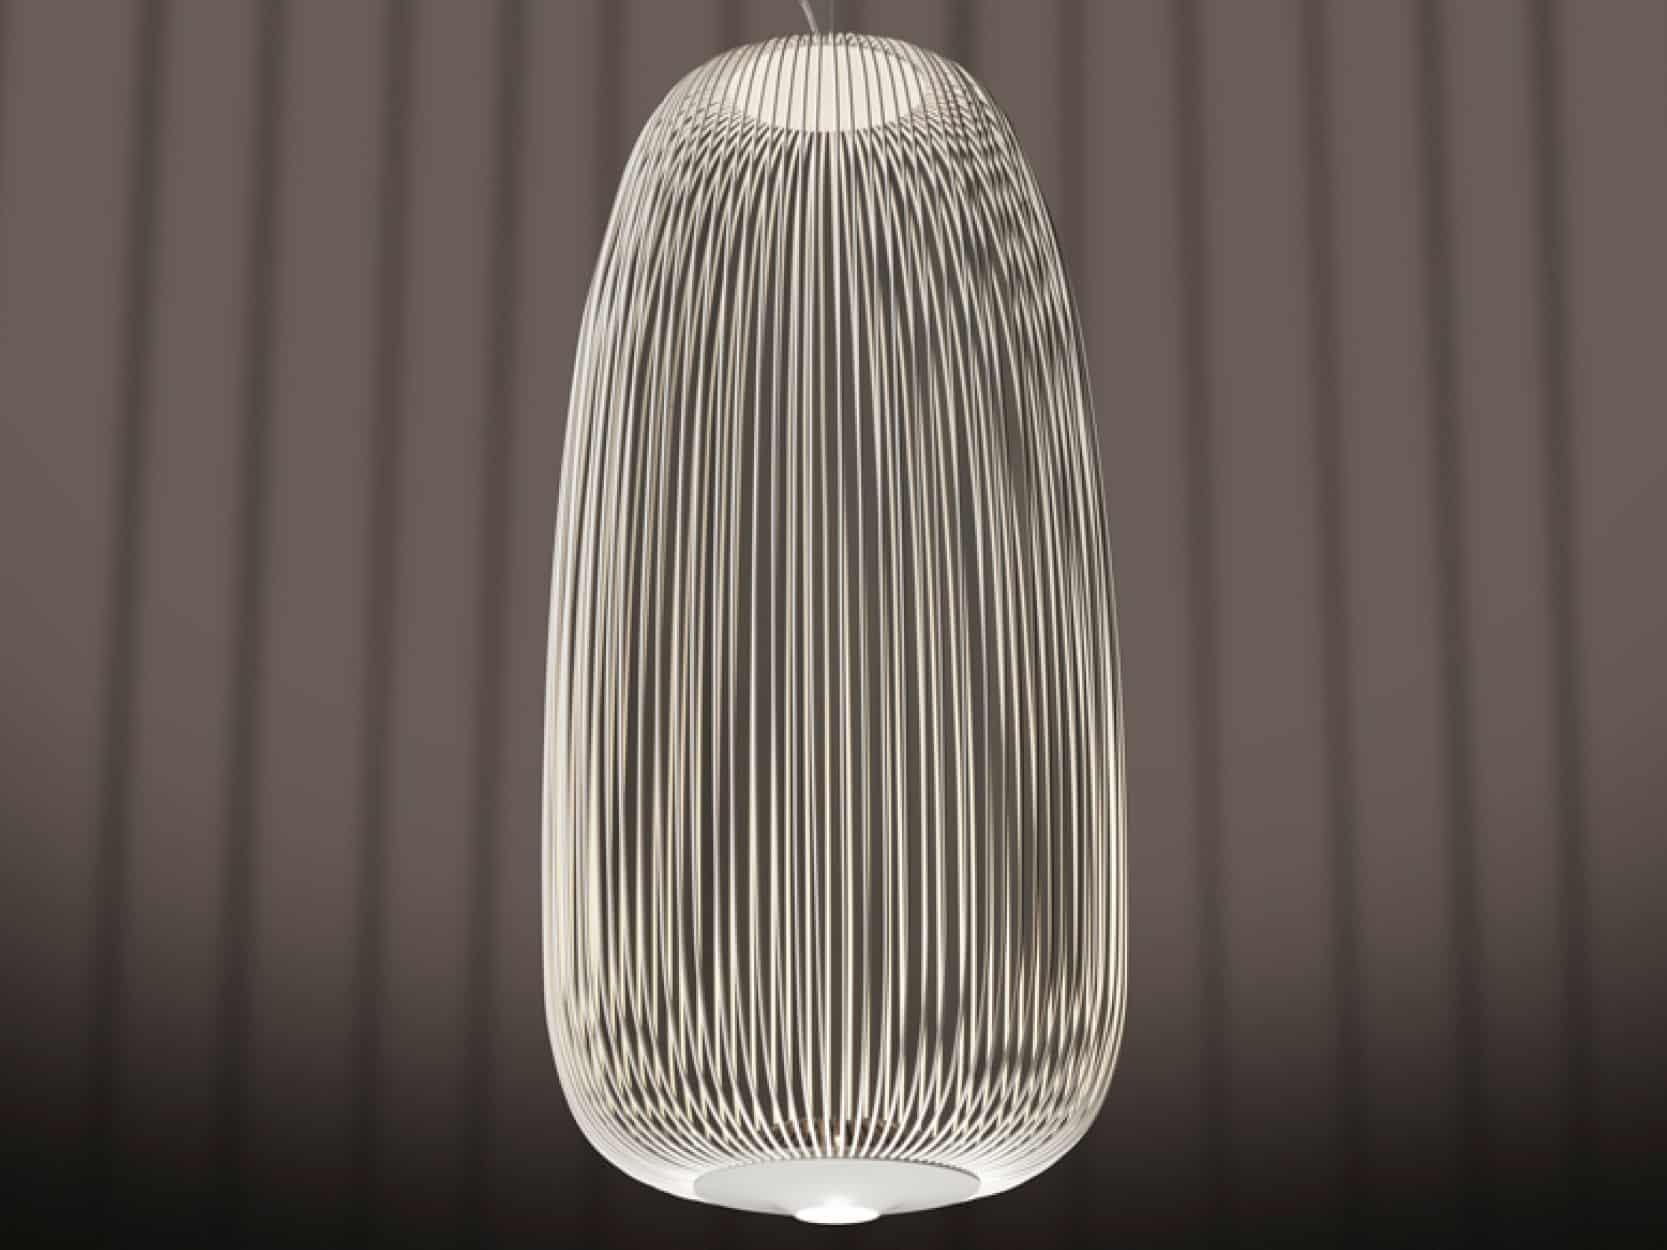 Foscarini hanglamp Spokes1 sfeer